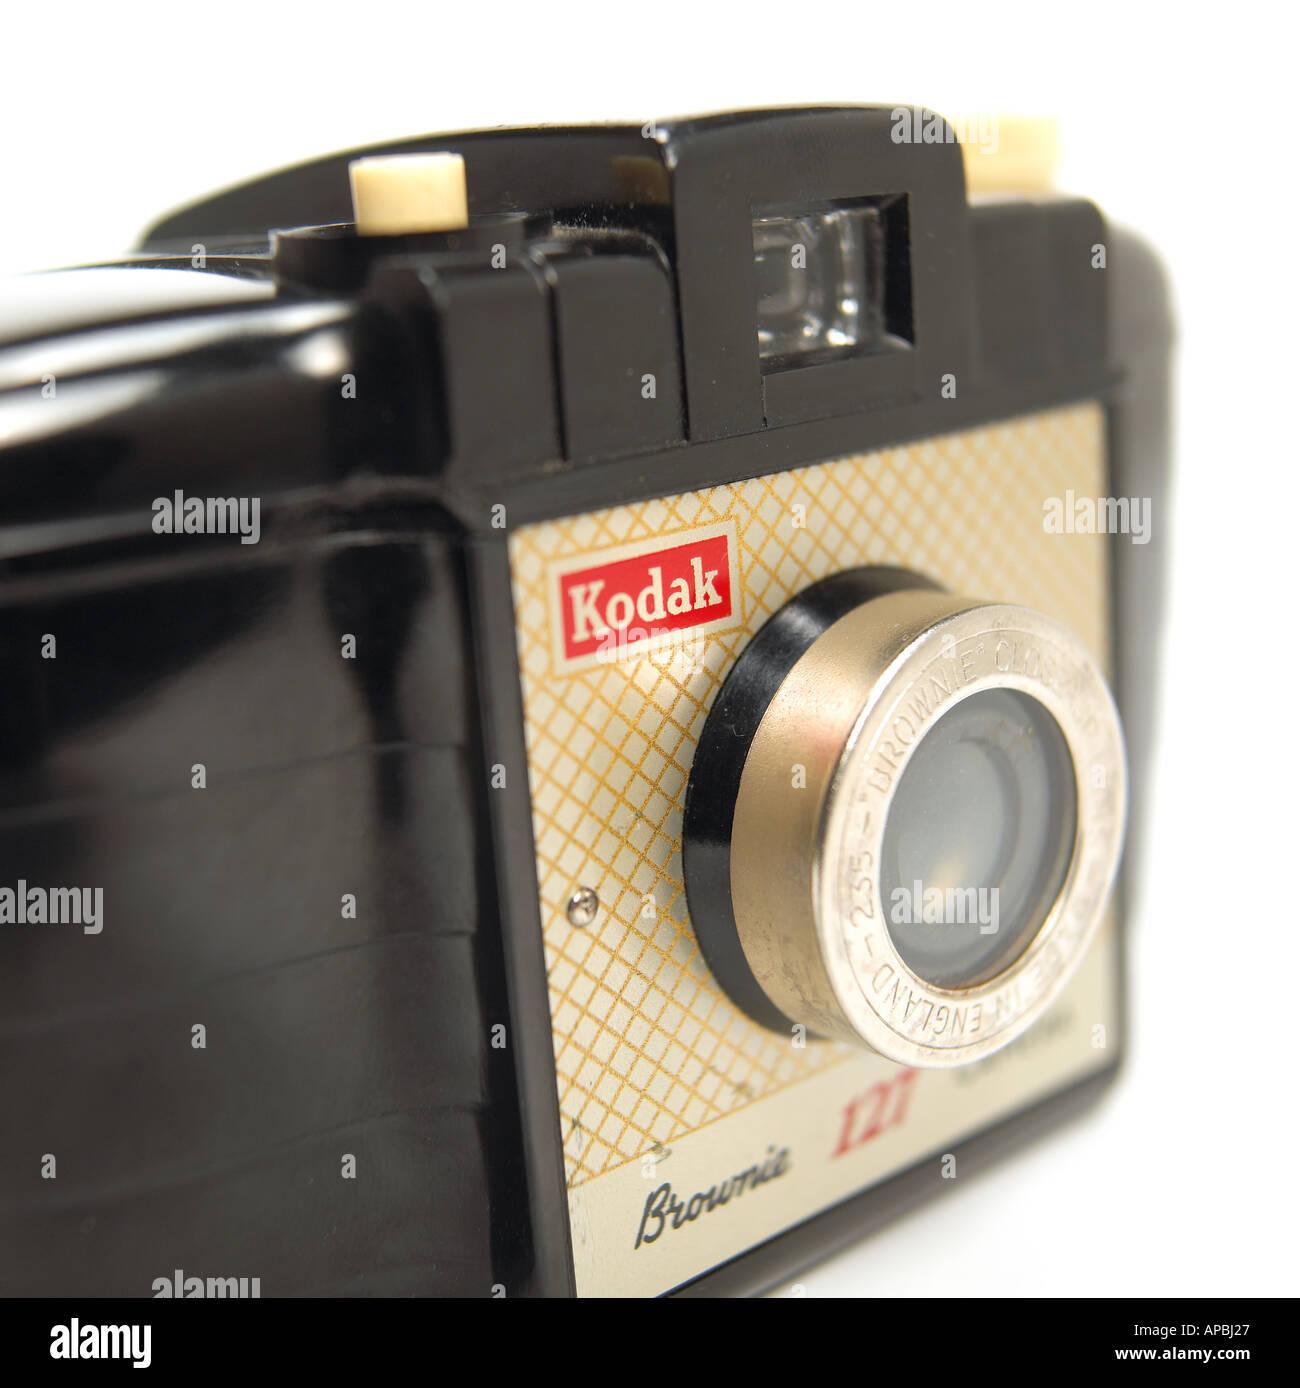 Kodak Box Brownie Camera - Stock Image